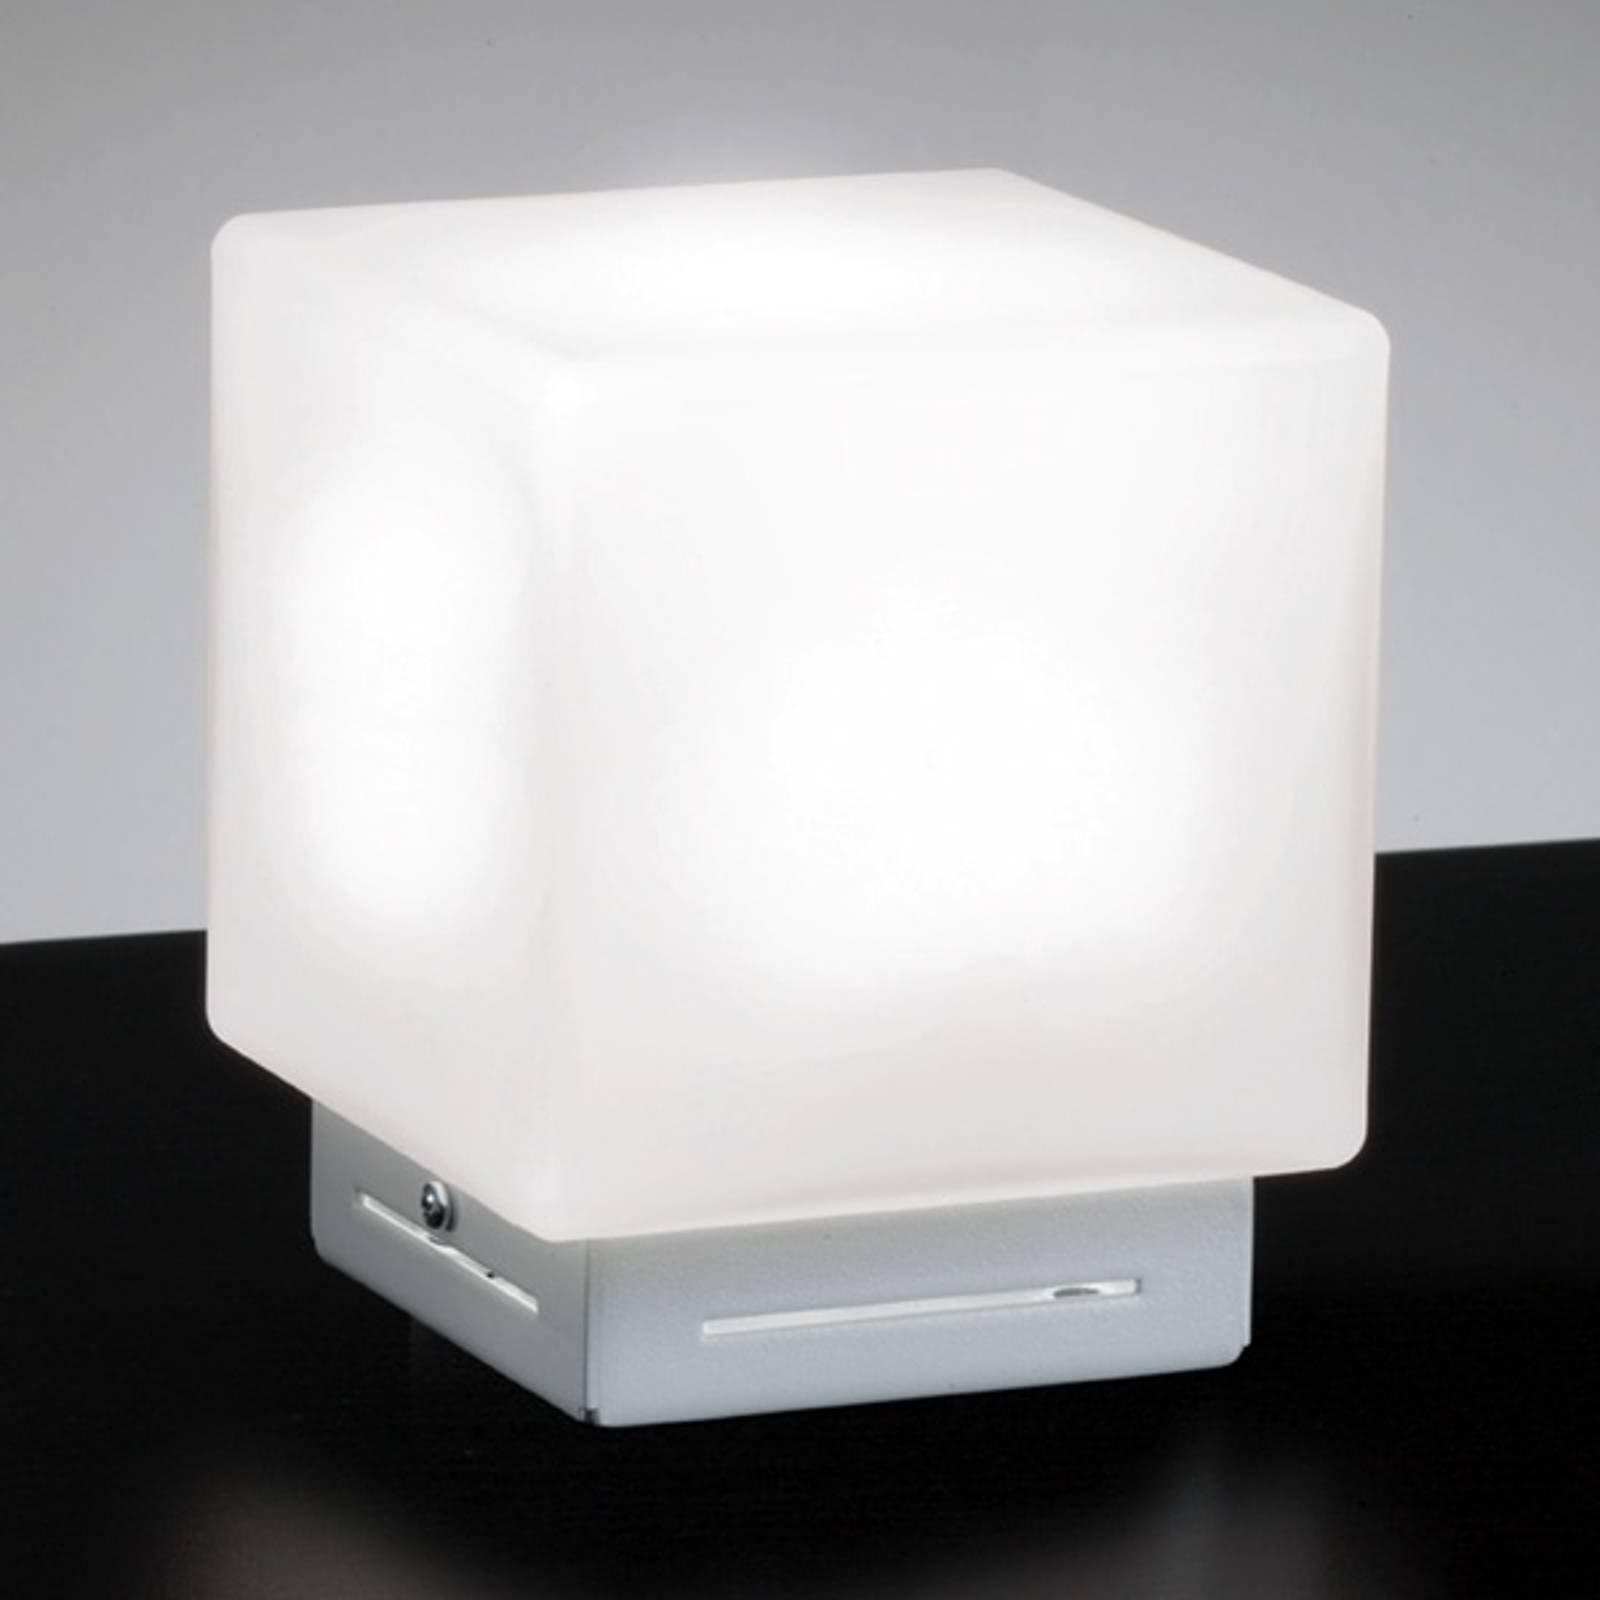 Cubis bordlampe i hvitt